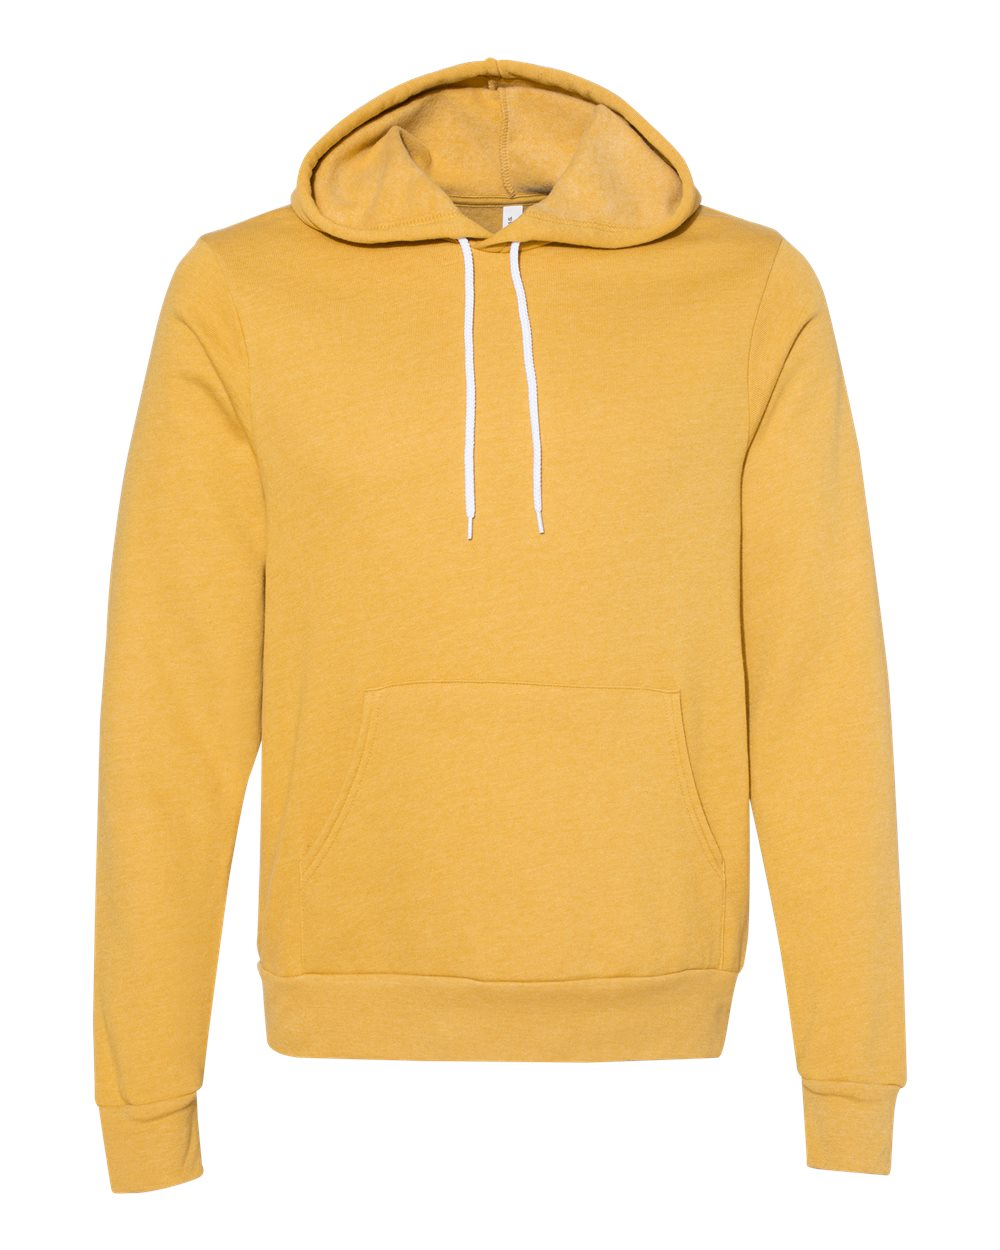 Bella-Canvas-Unisex-Sponge-Hooded-Pullover-Sweatshirt-Blank-3719-up-to-2XL thumbnail 49